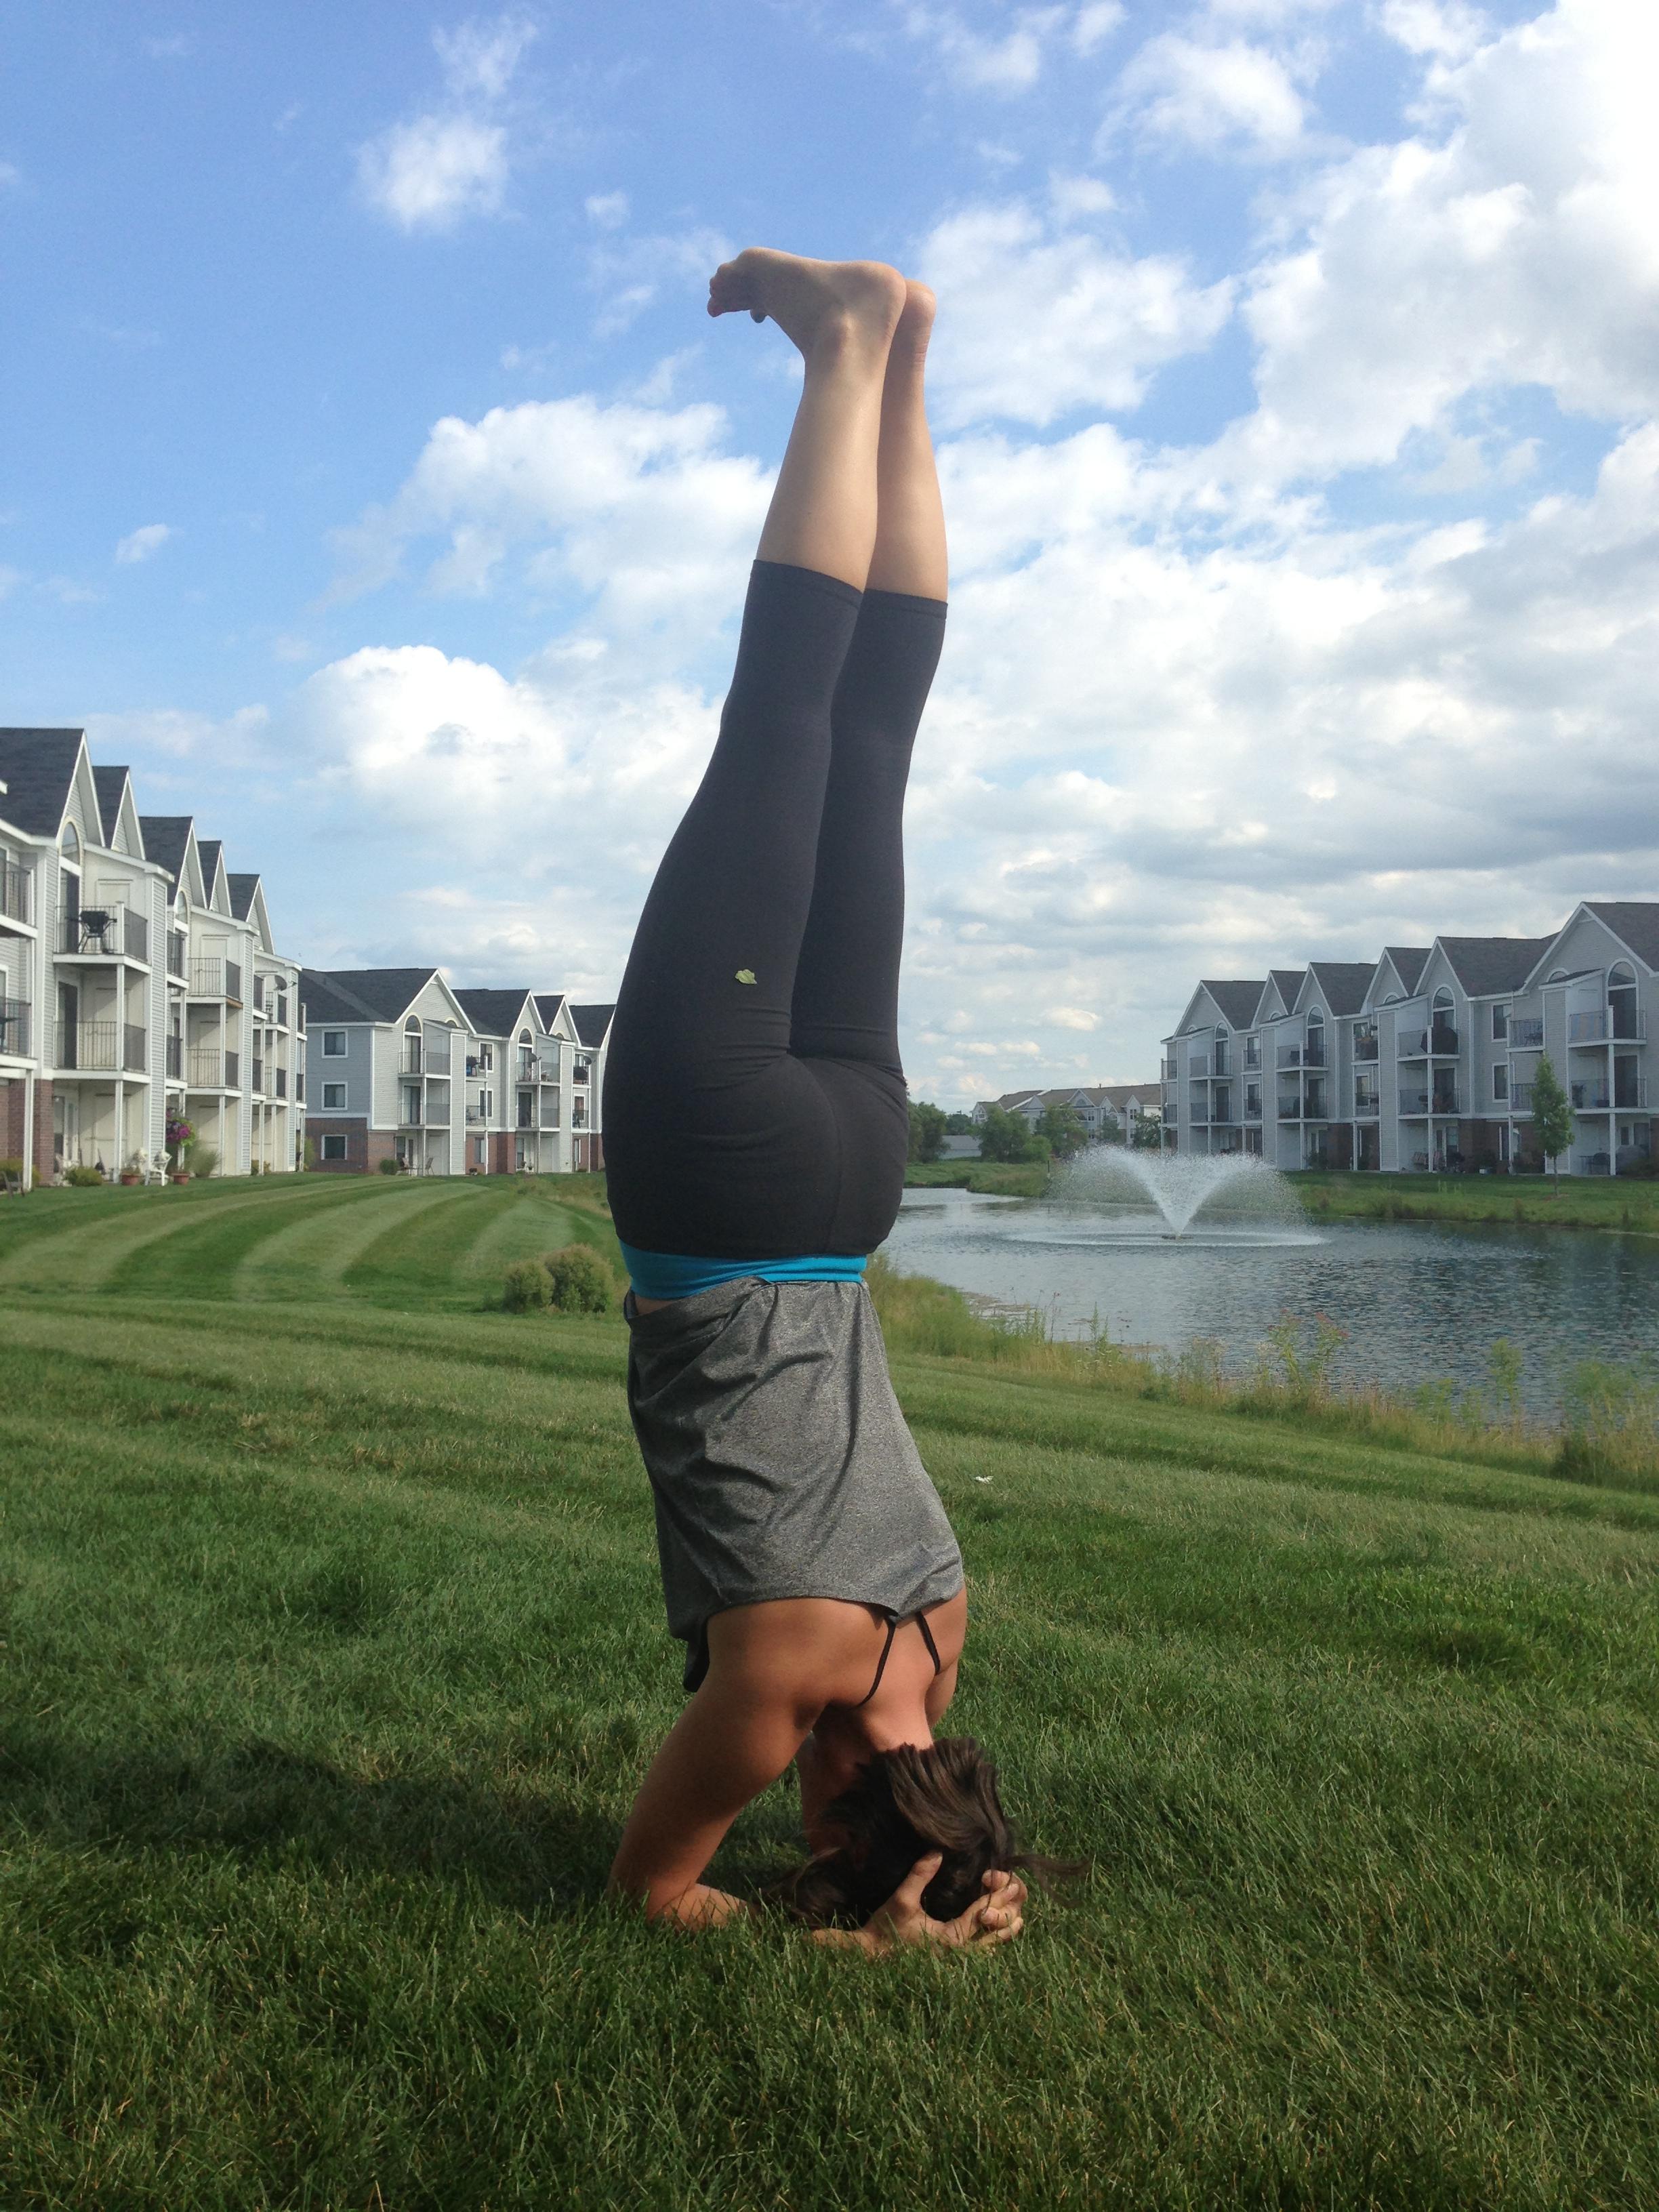 Summer of 2013, during my RYT200 Yoga teacher training